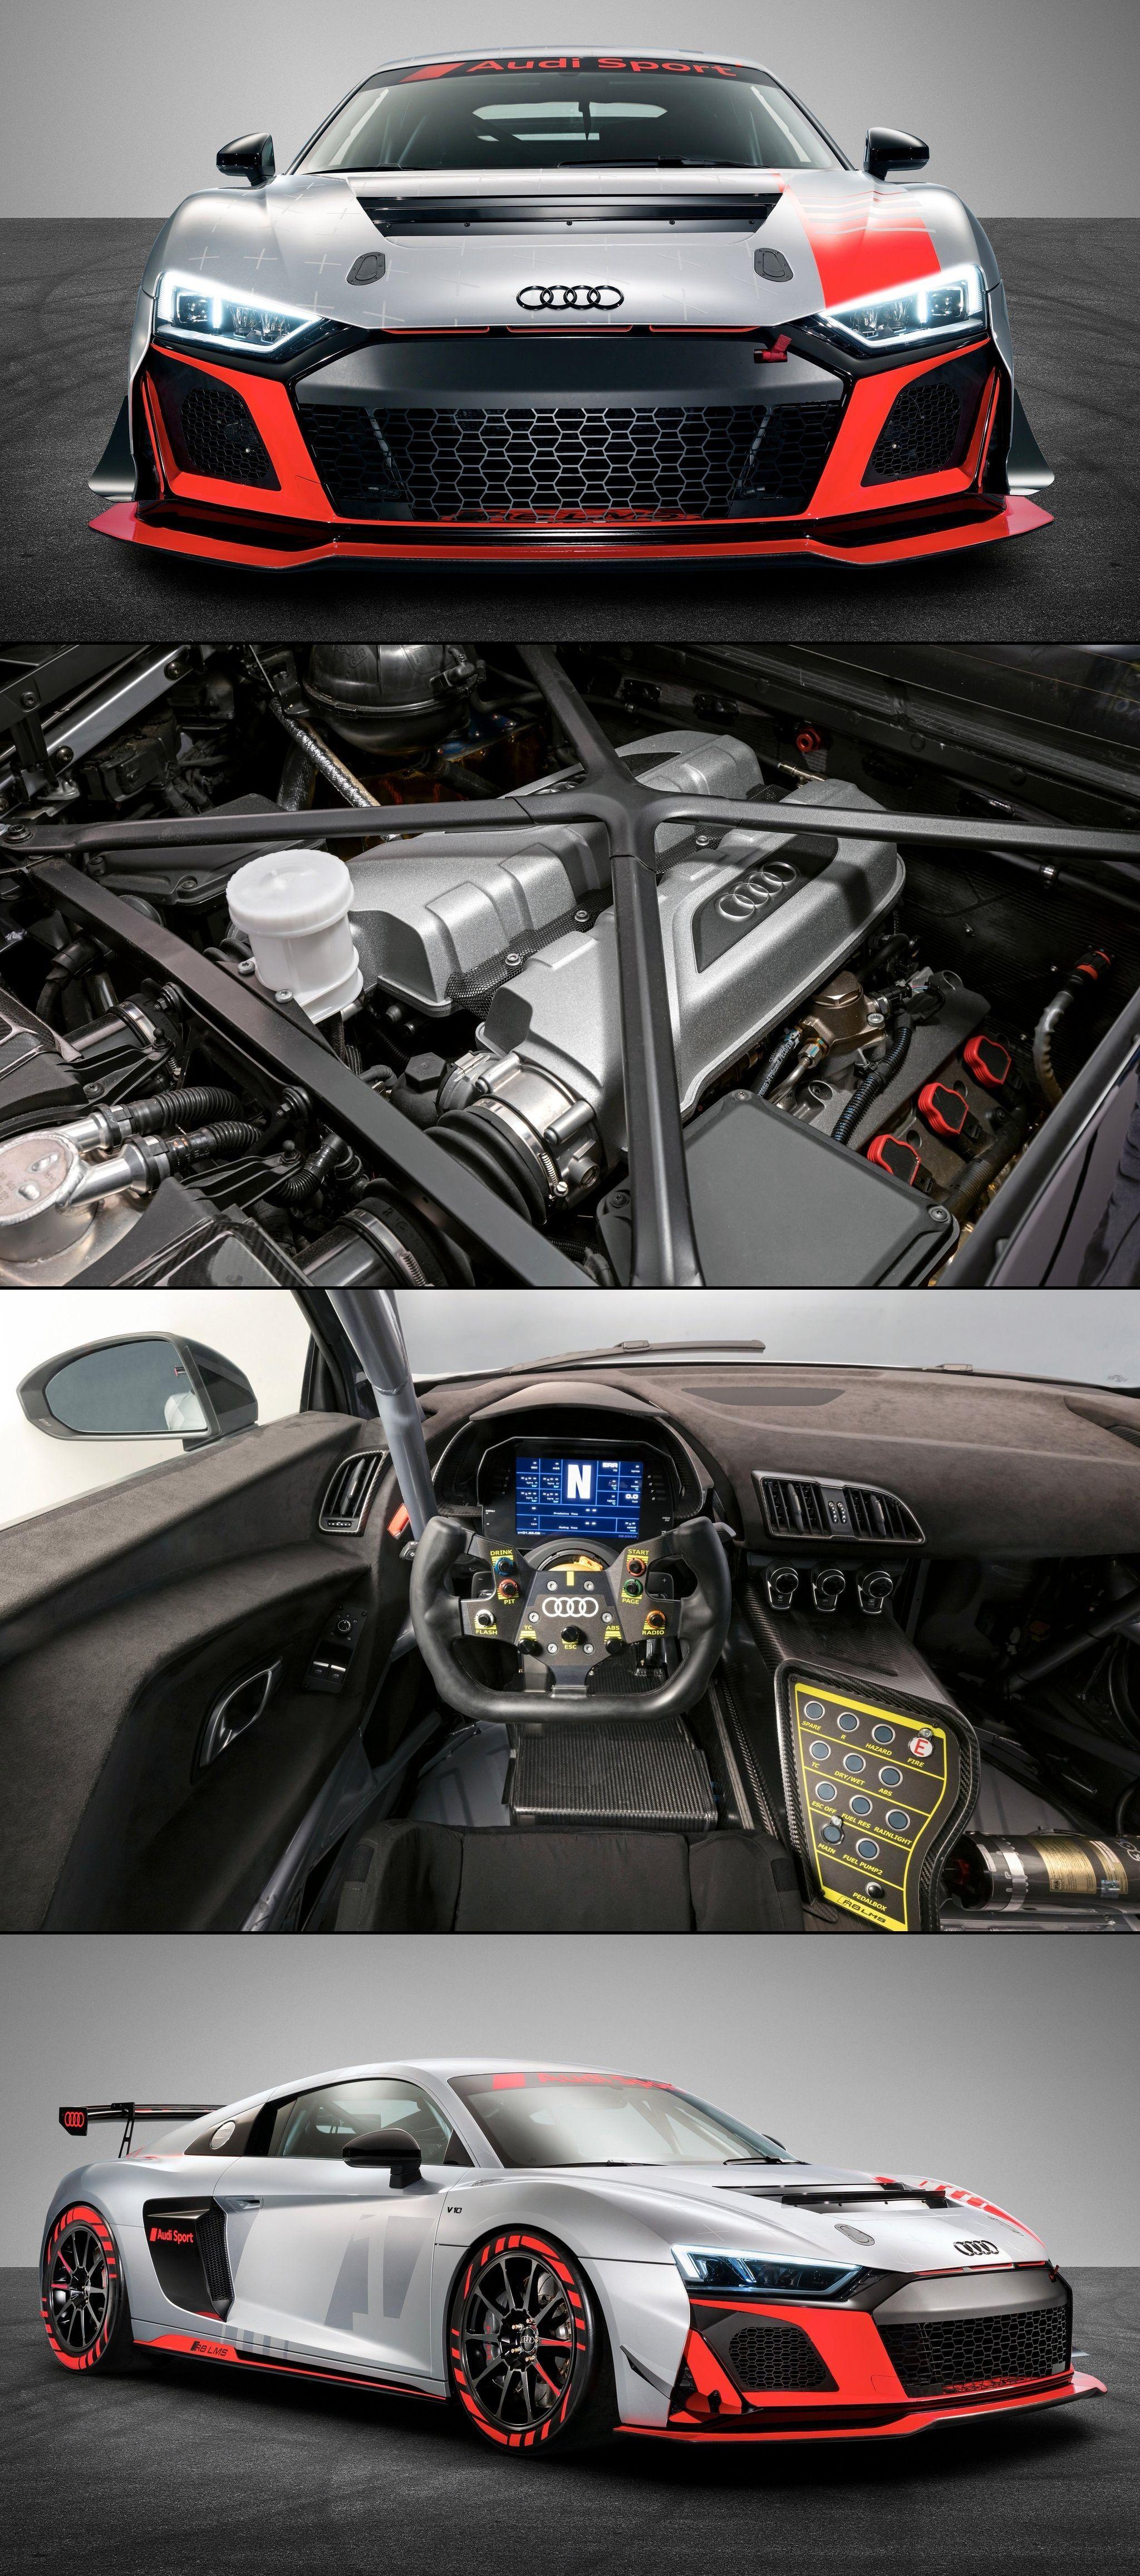 Audi R8 LMS GT4 (2020) #audir8 Audi R8 LMS GT4 (2020) #audir8